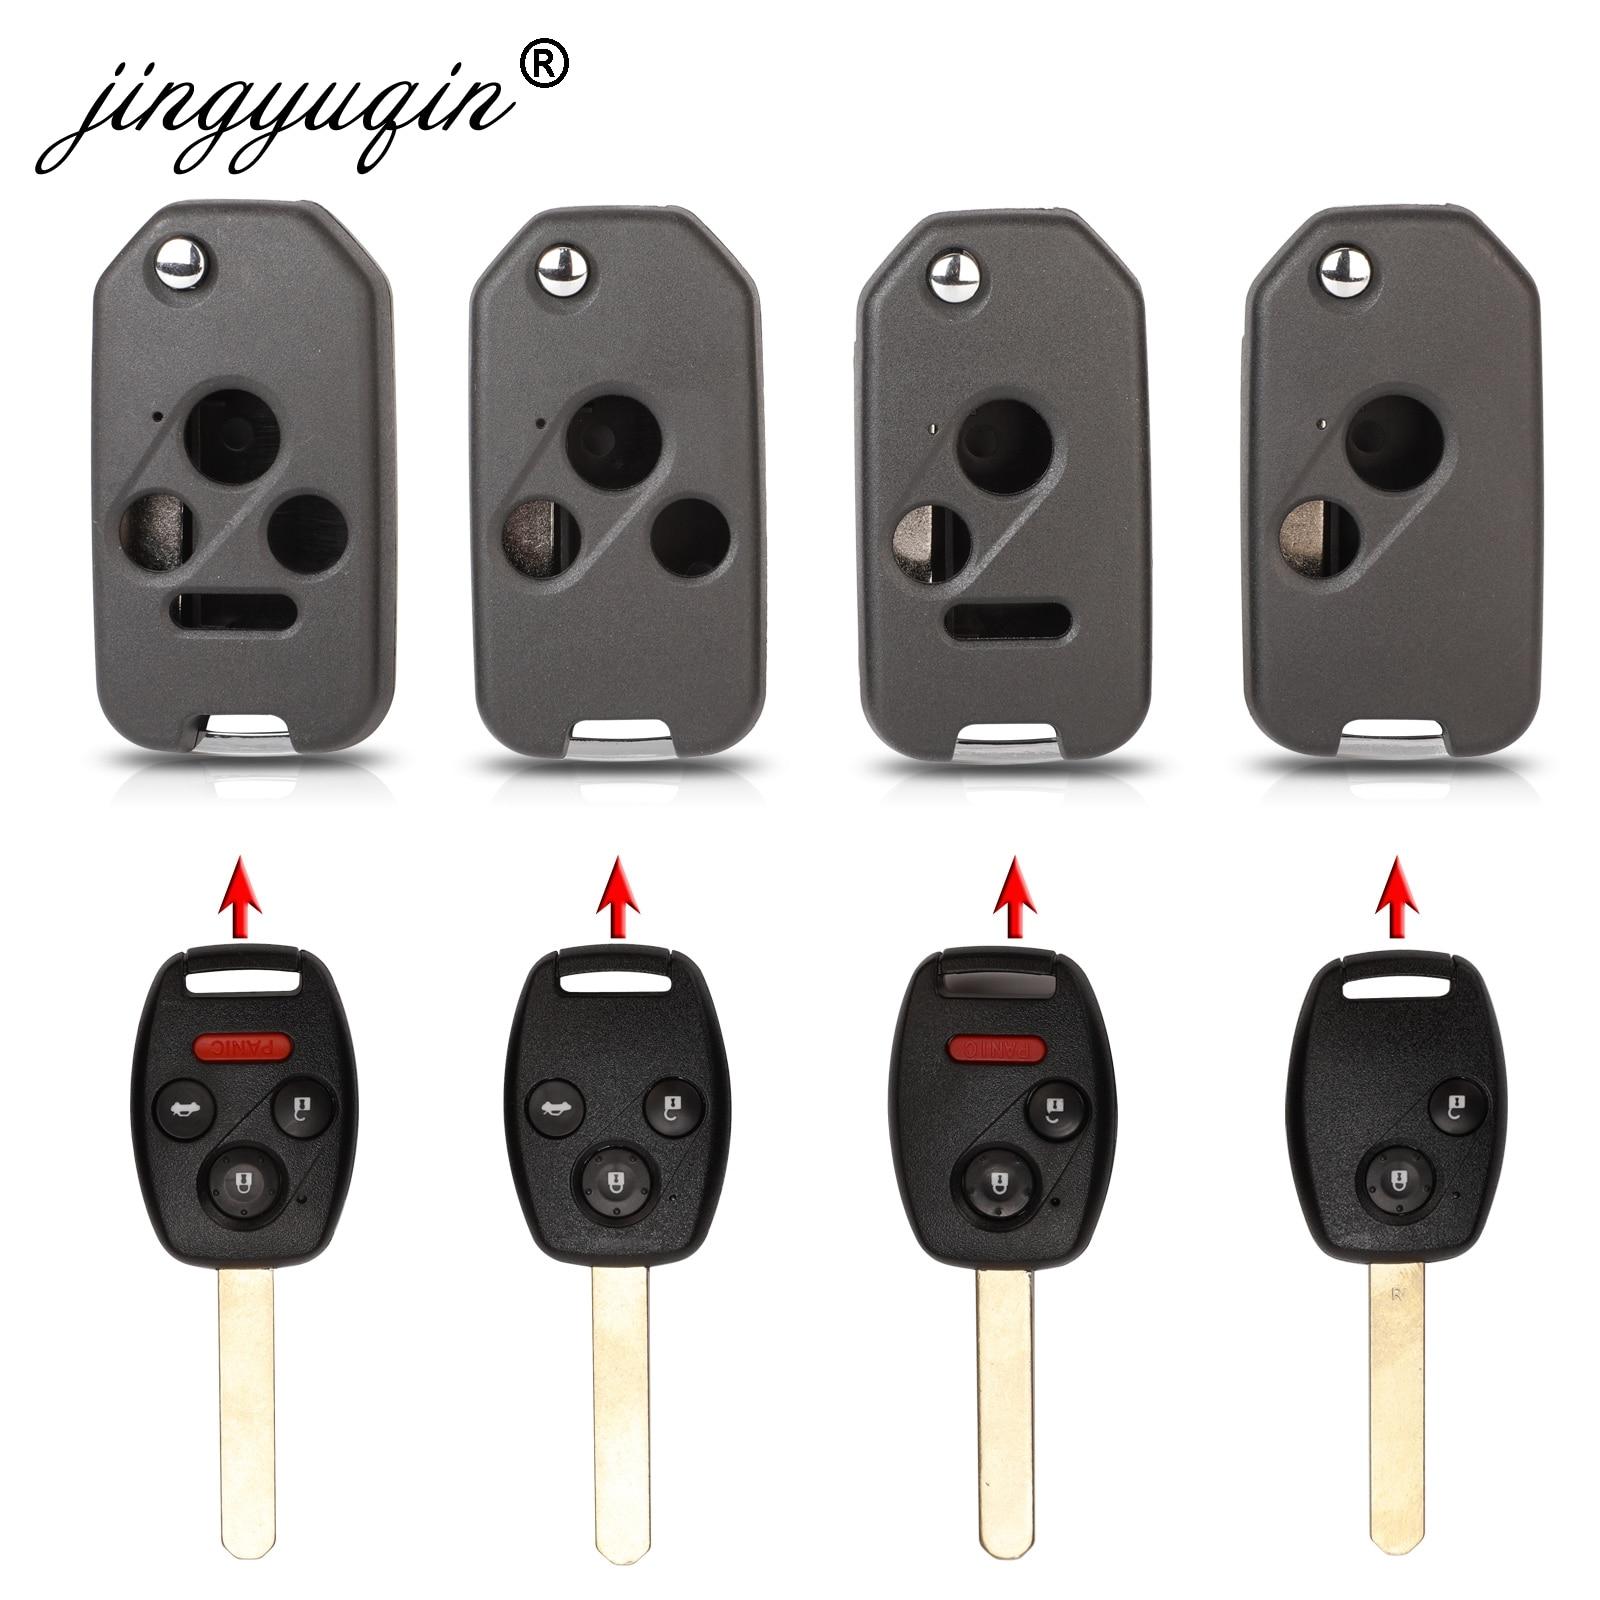 3 button Flip Remote Key Fob Shell  For Honda Jazz Civic Accord CRV FRV HRV